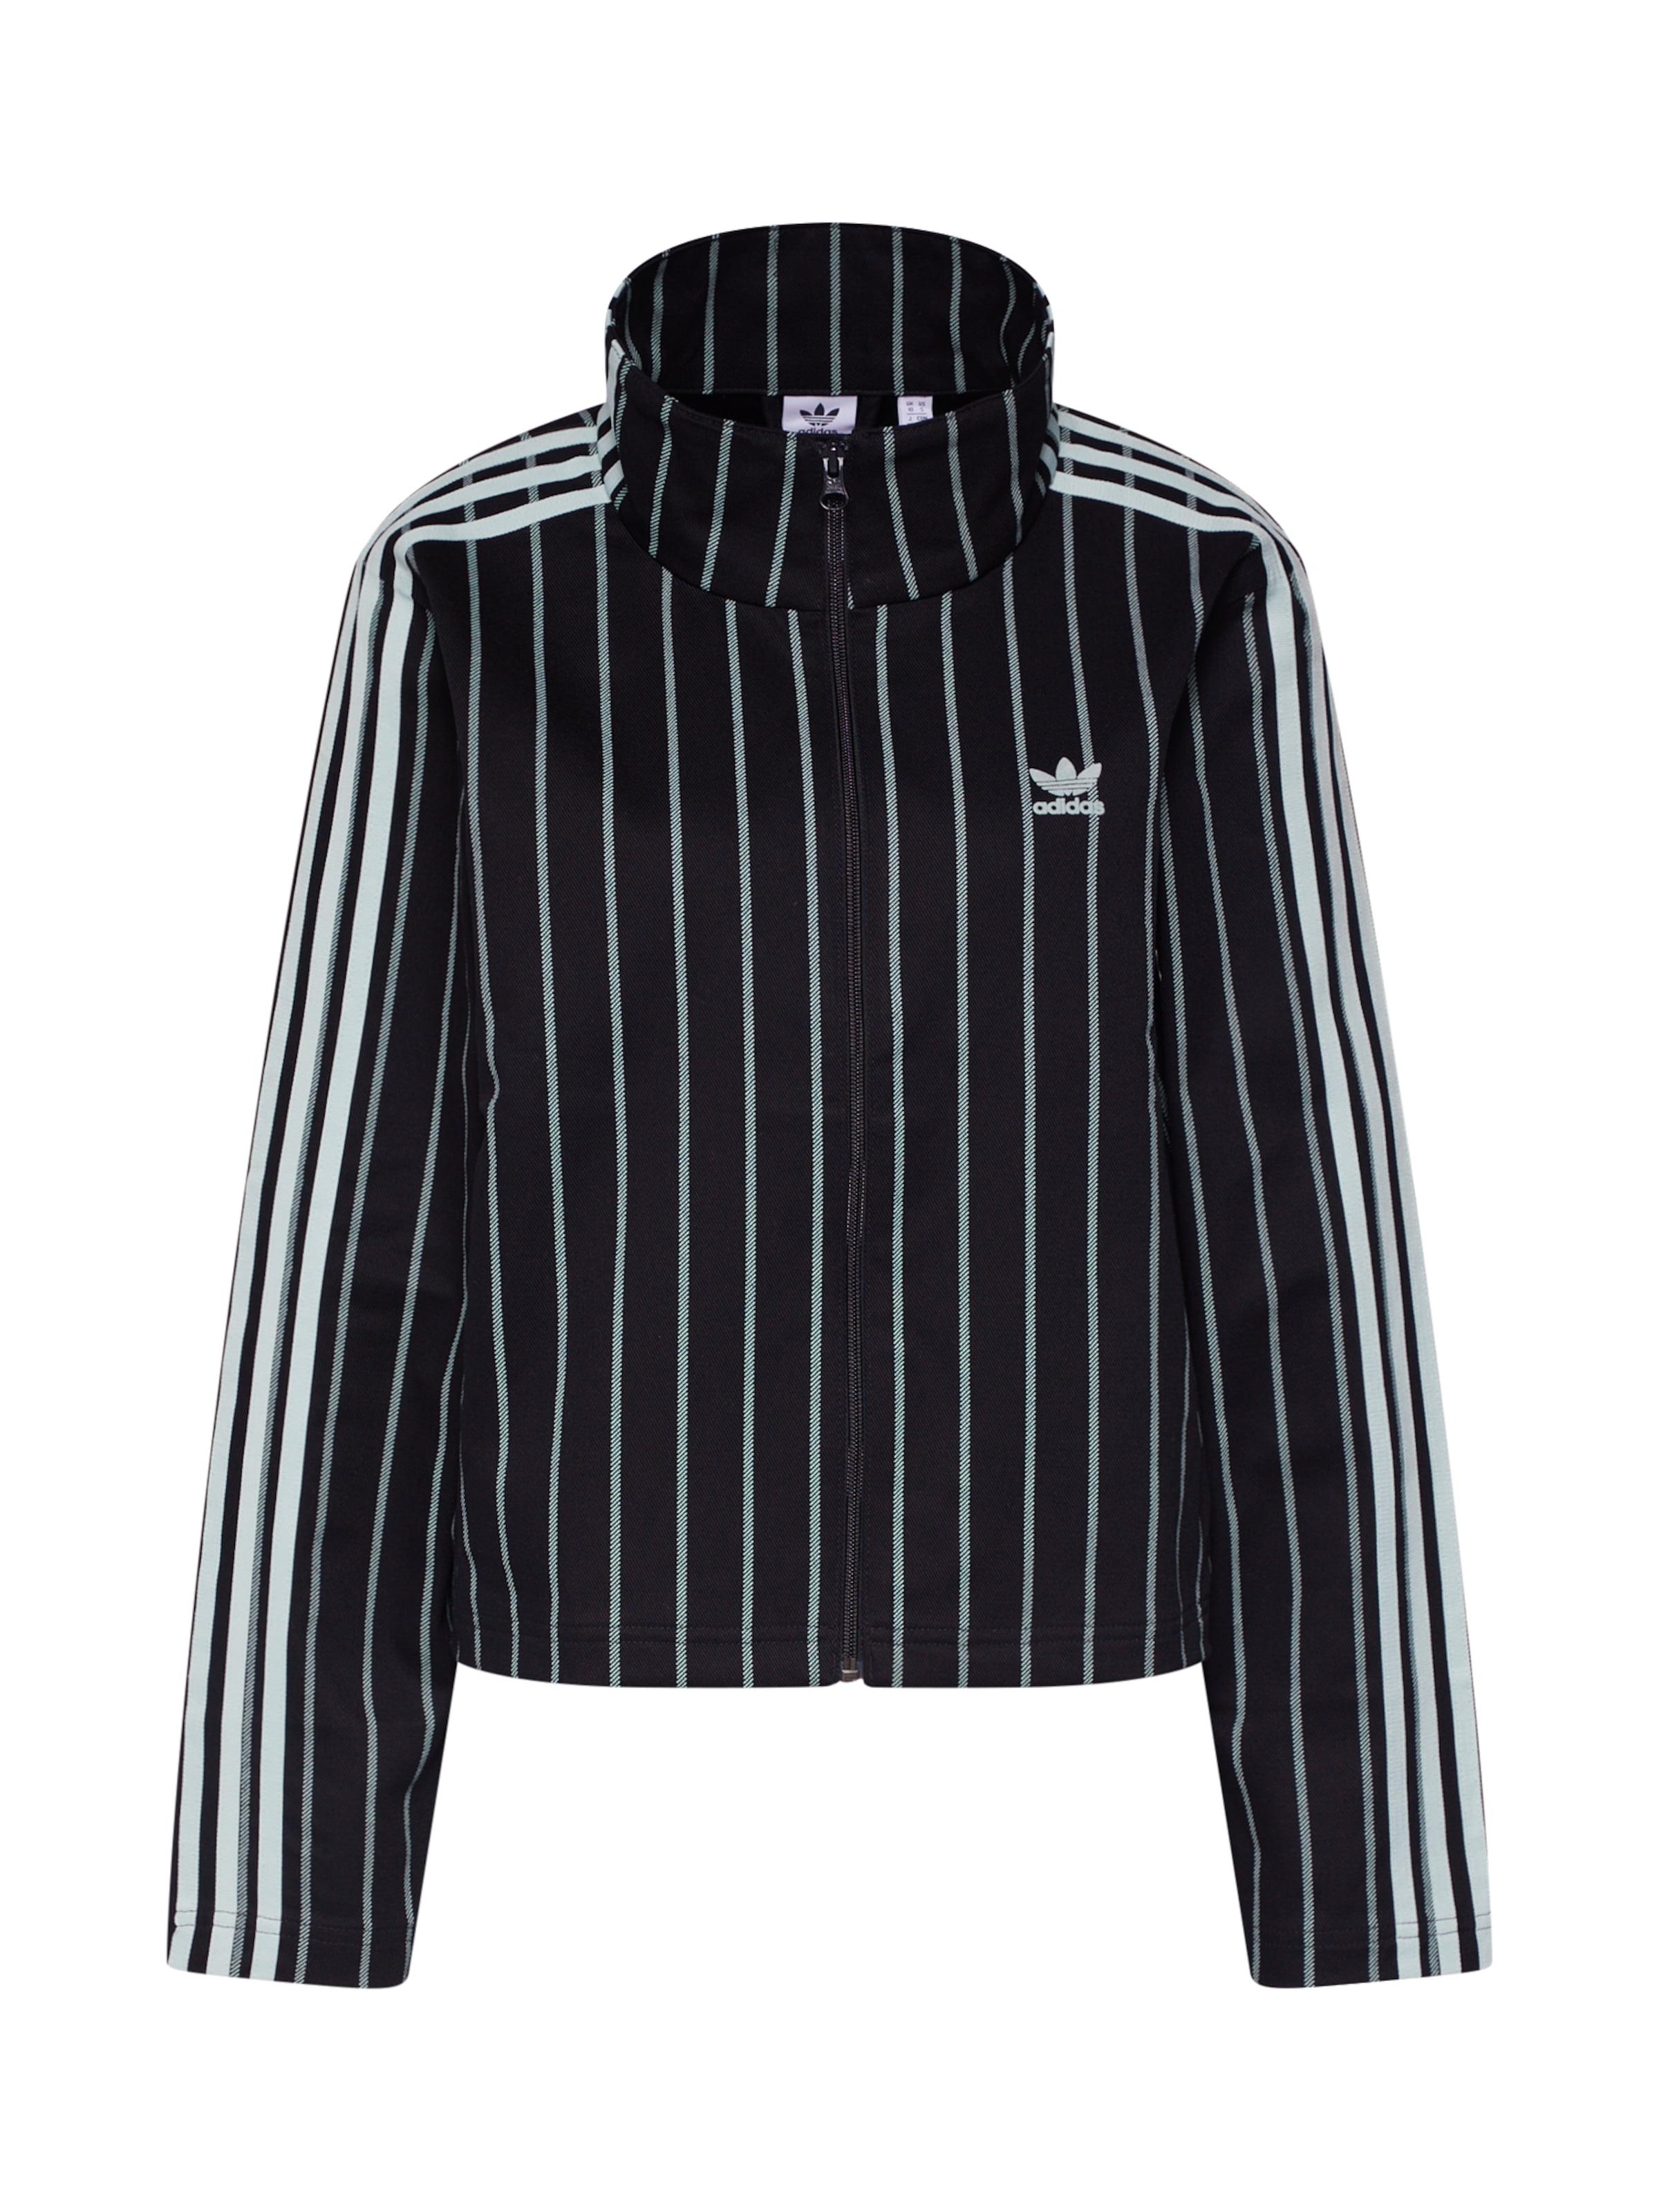 In VertNoir OriginalsVeste Mi Top' Adidas saison 'track gIY76ybfv